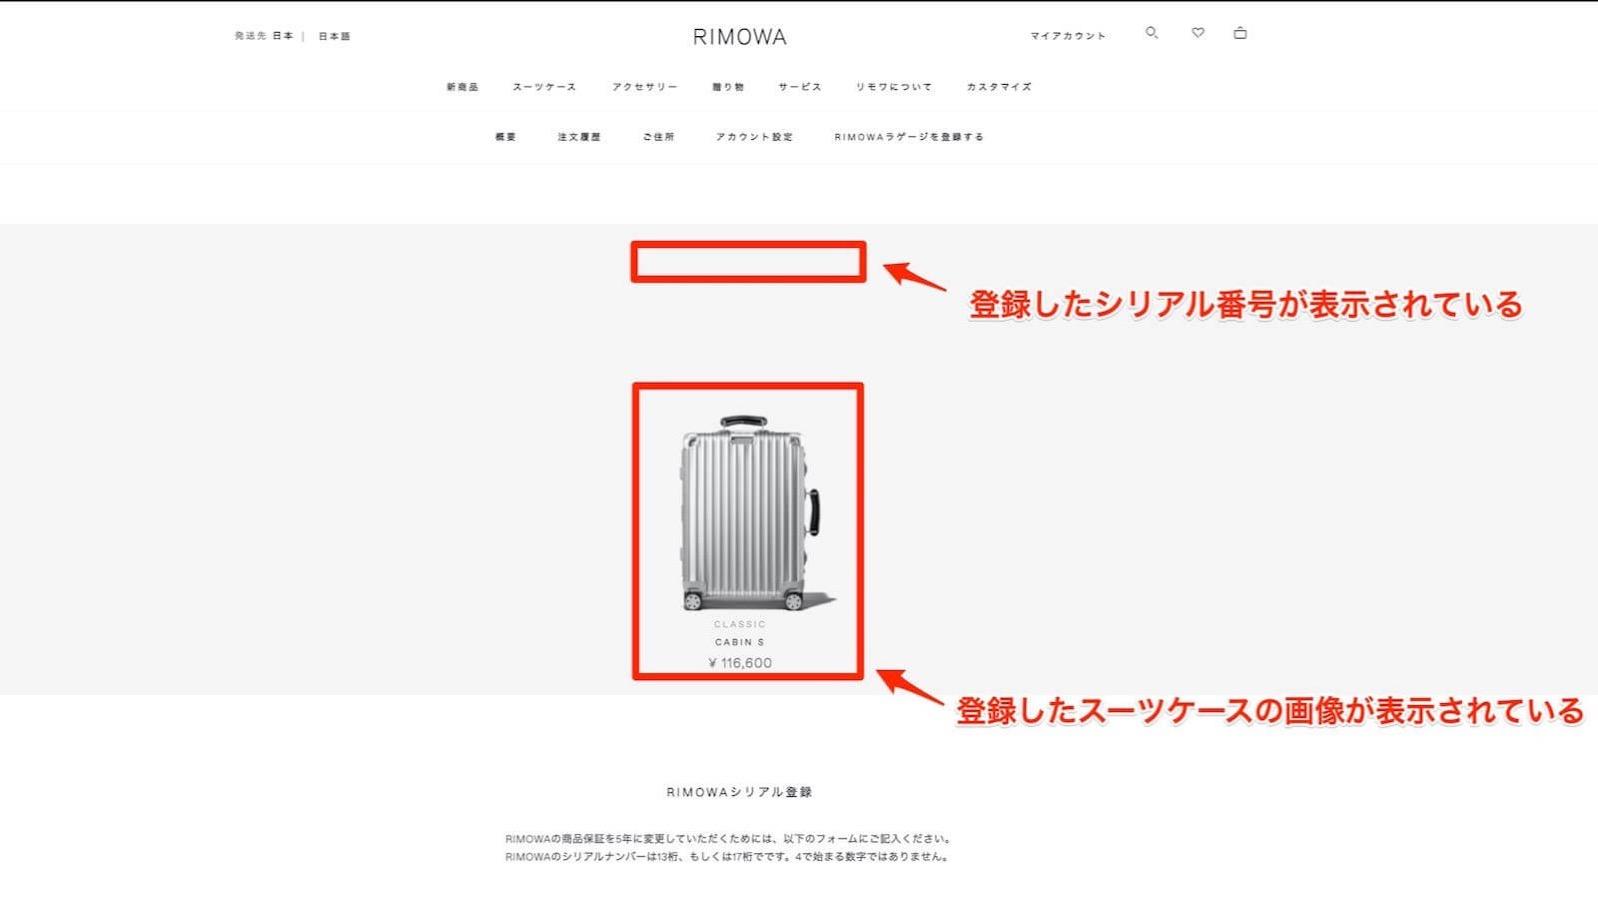 0229 Rimowa online registration method 14